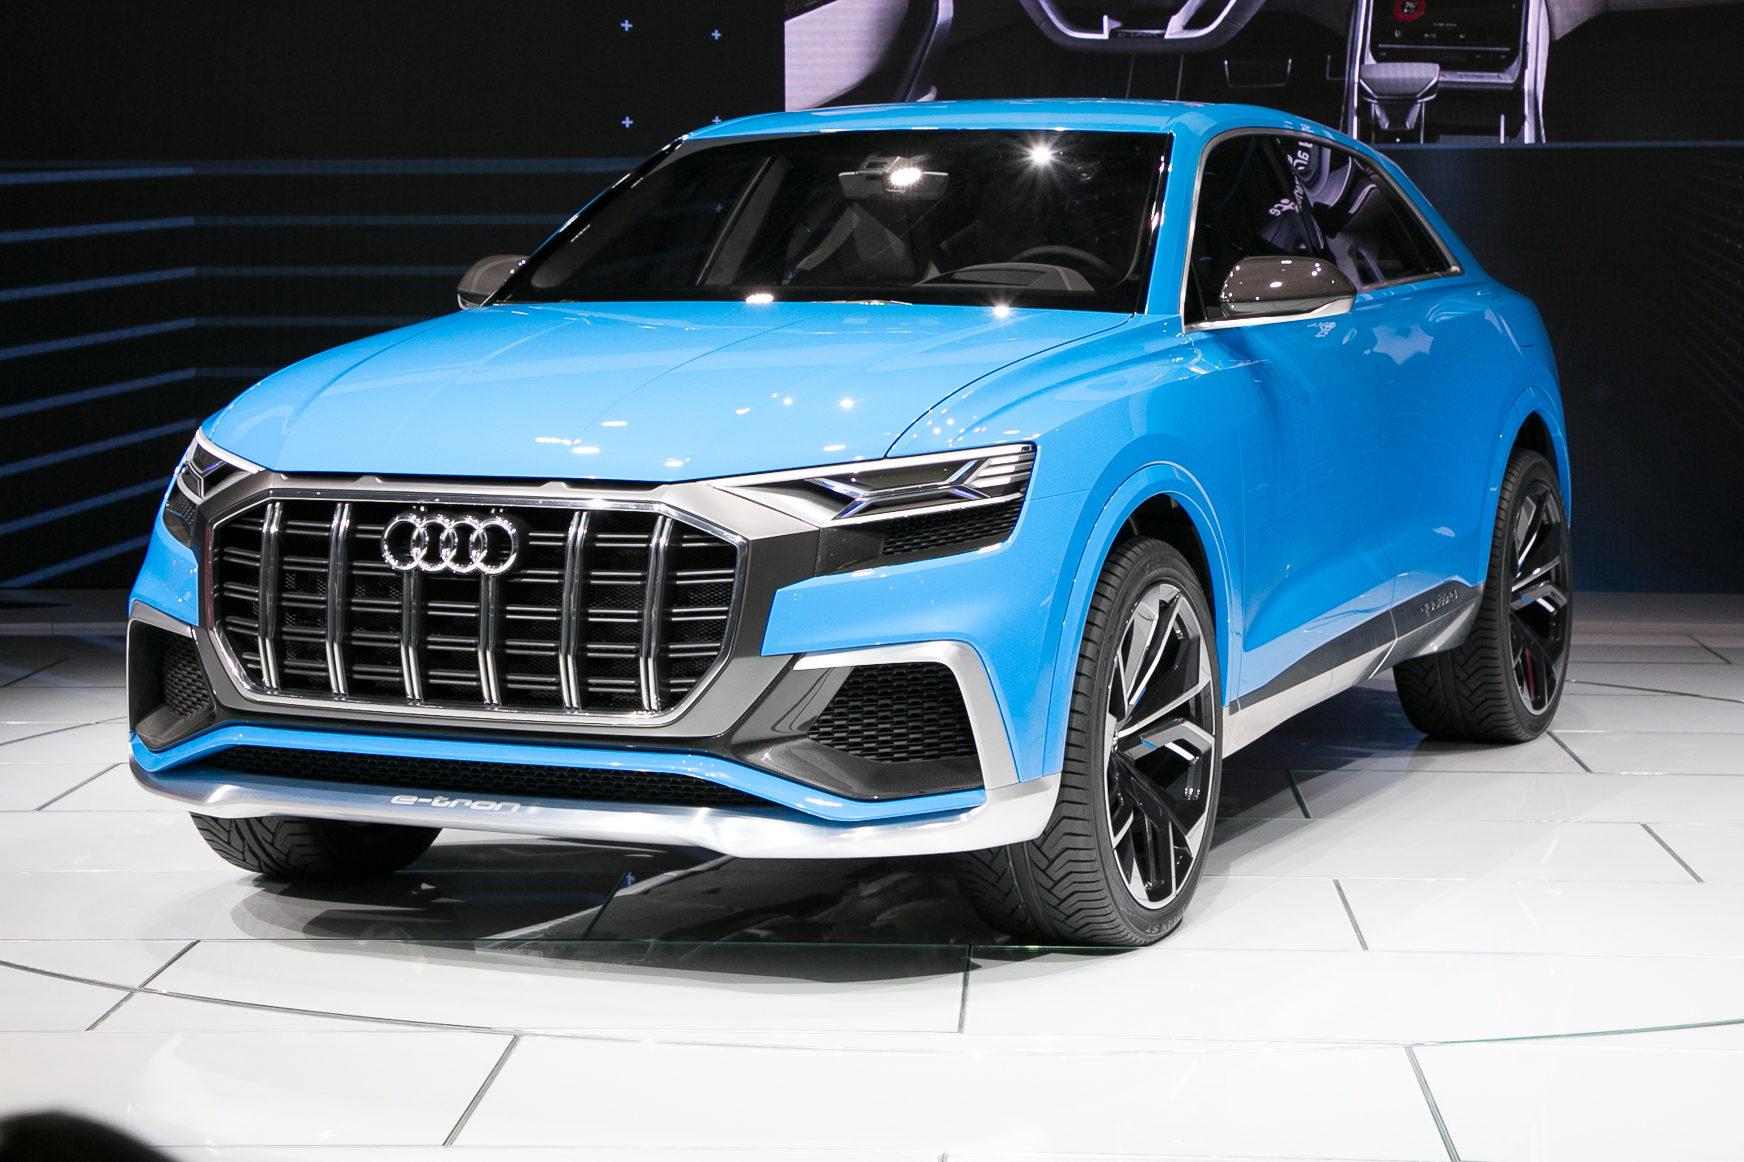 Audi Q8 Concept Front Three Quarter 01 E1483983924827